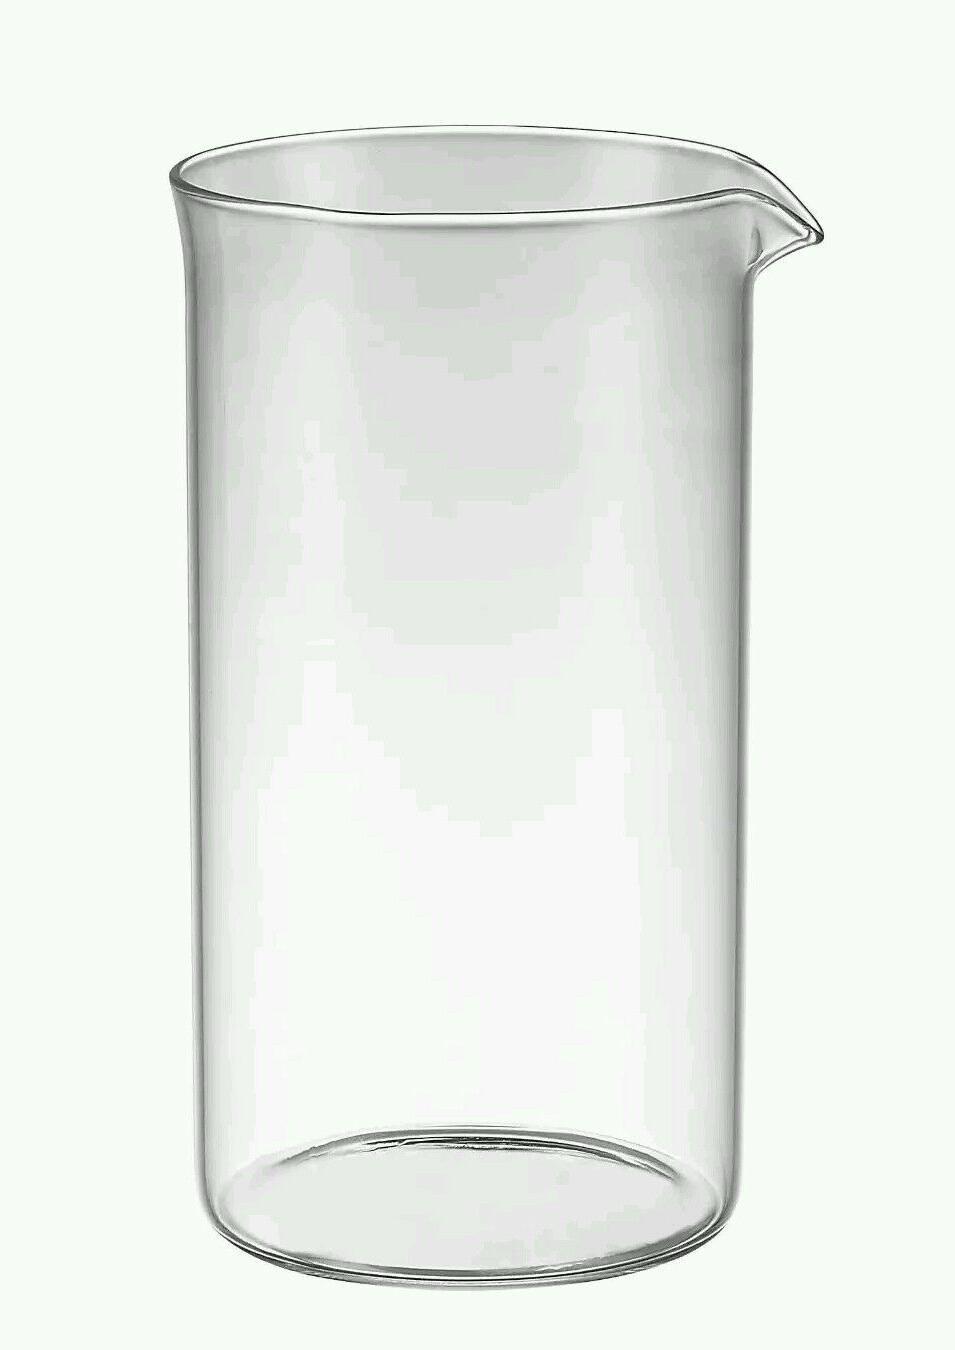 French Press Coffee 8-Cup Glass Carafe Jug Jar Beaker will F